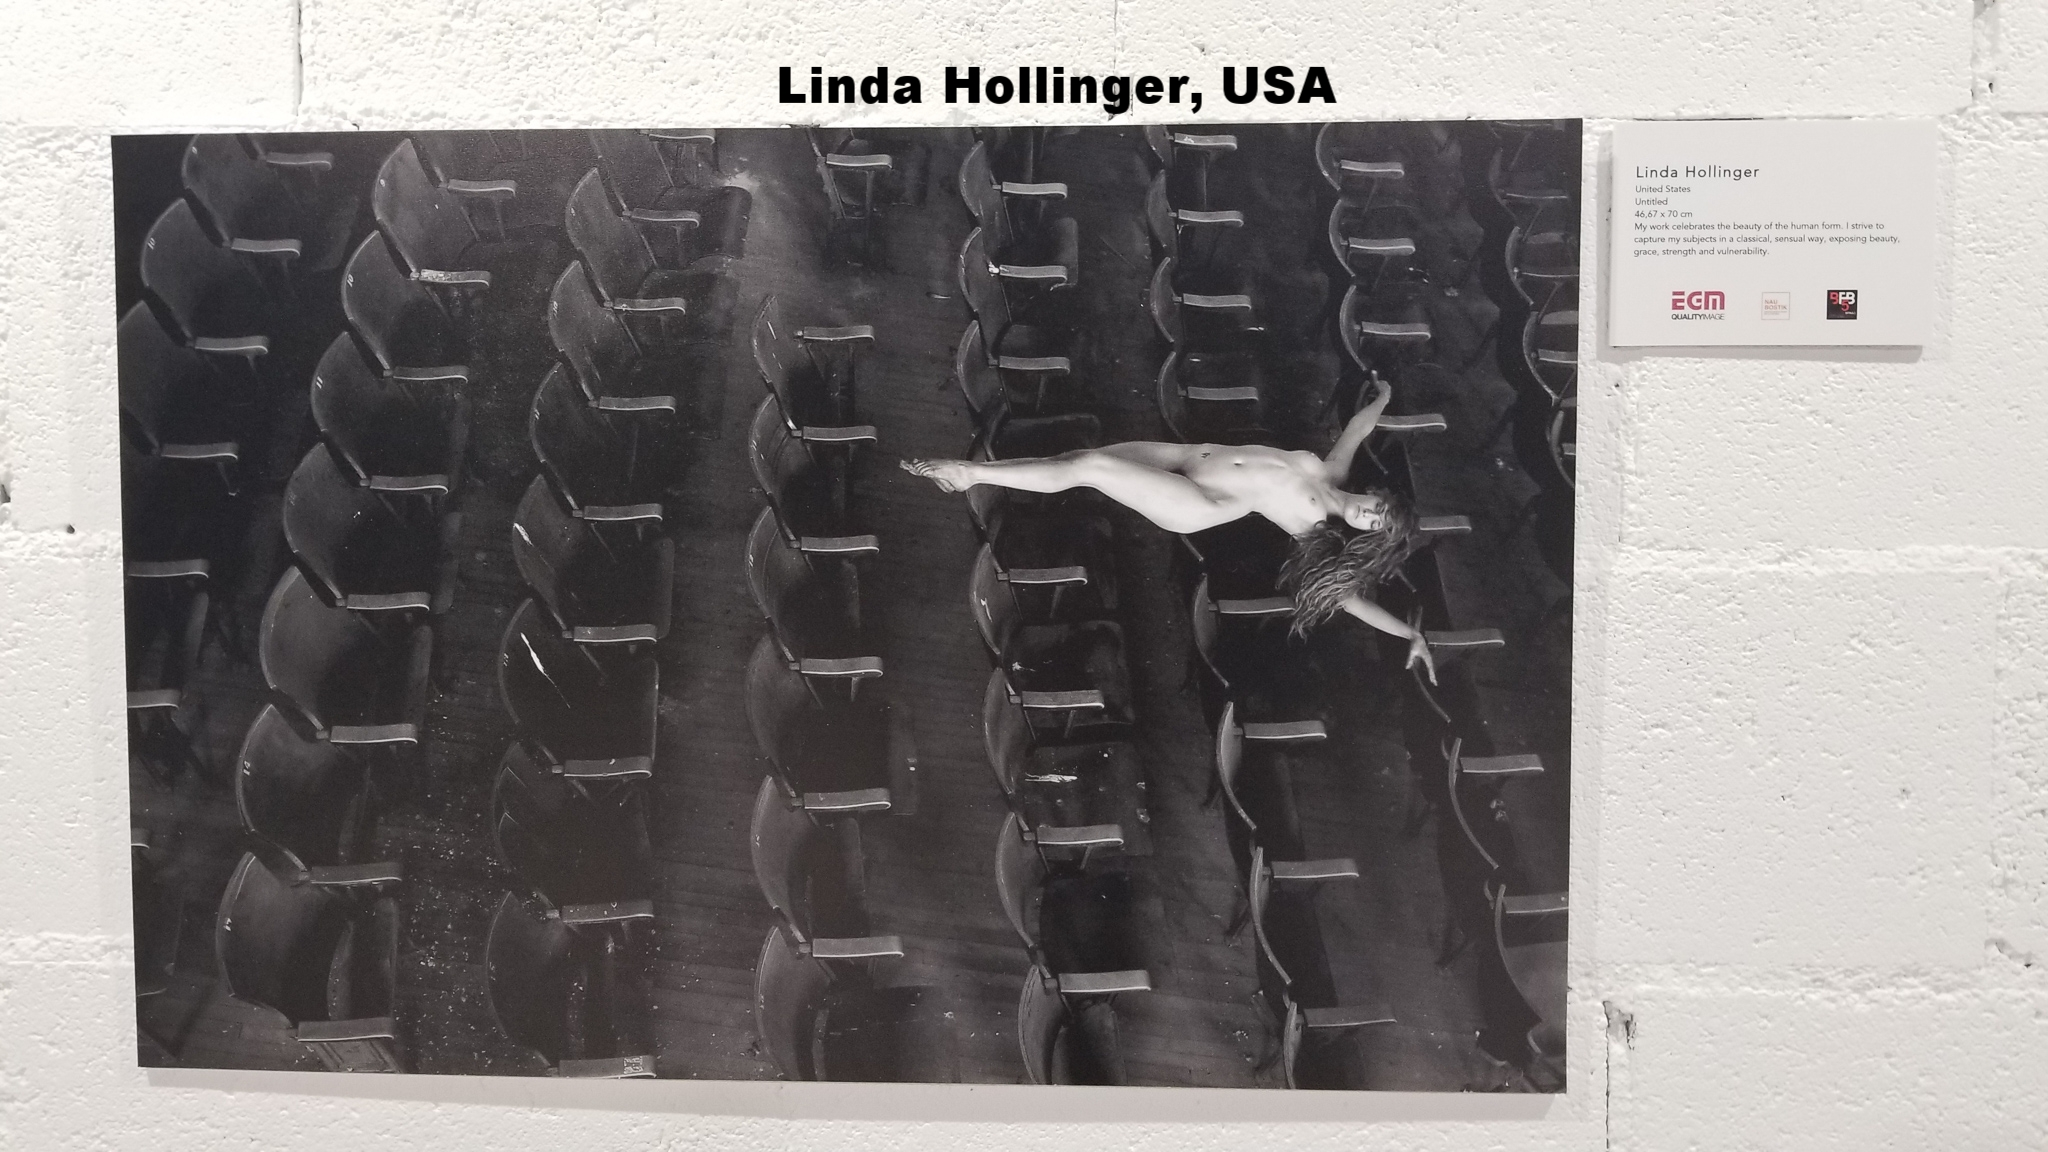 Linda Hollinger, Unites States